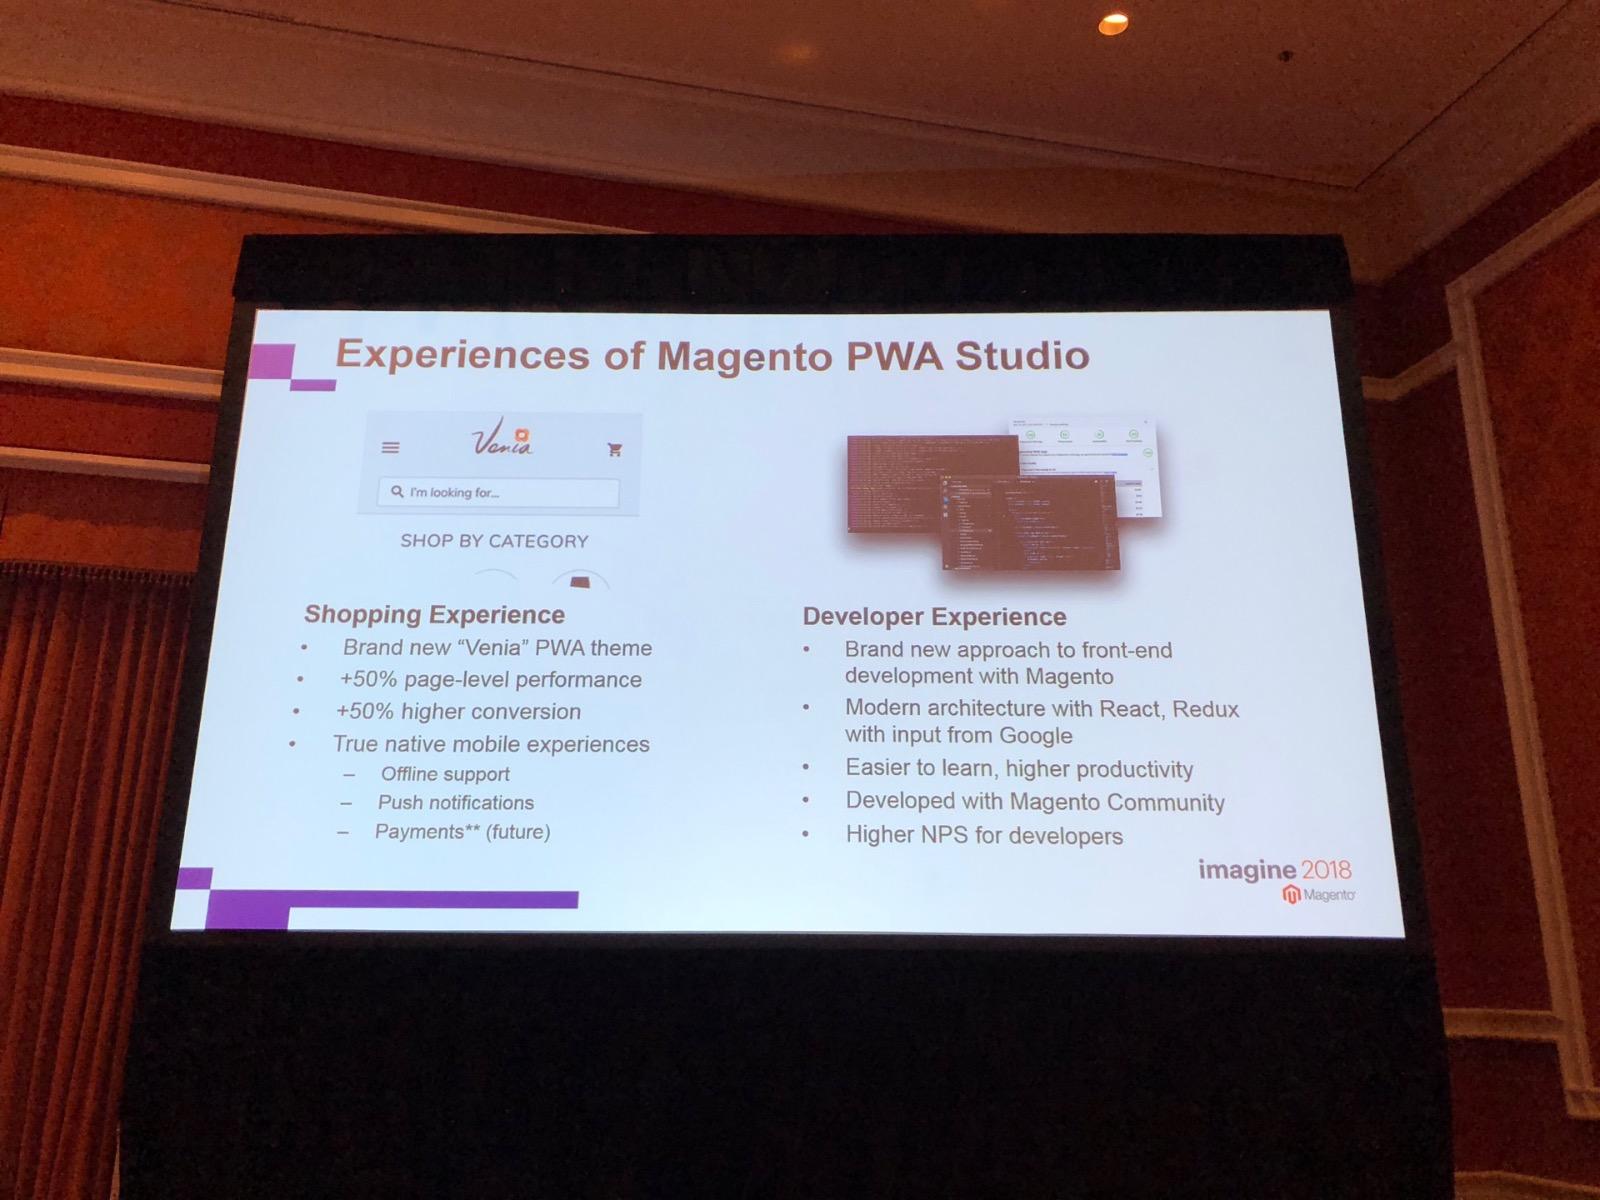 Magento Progressive Web App Studio